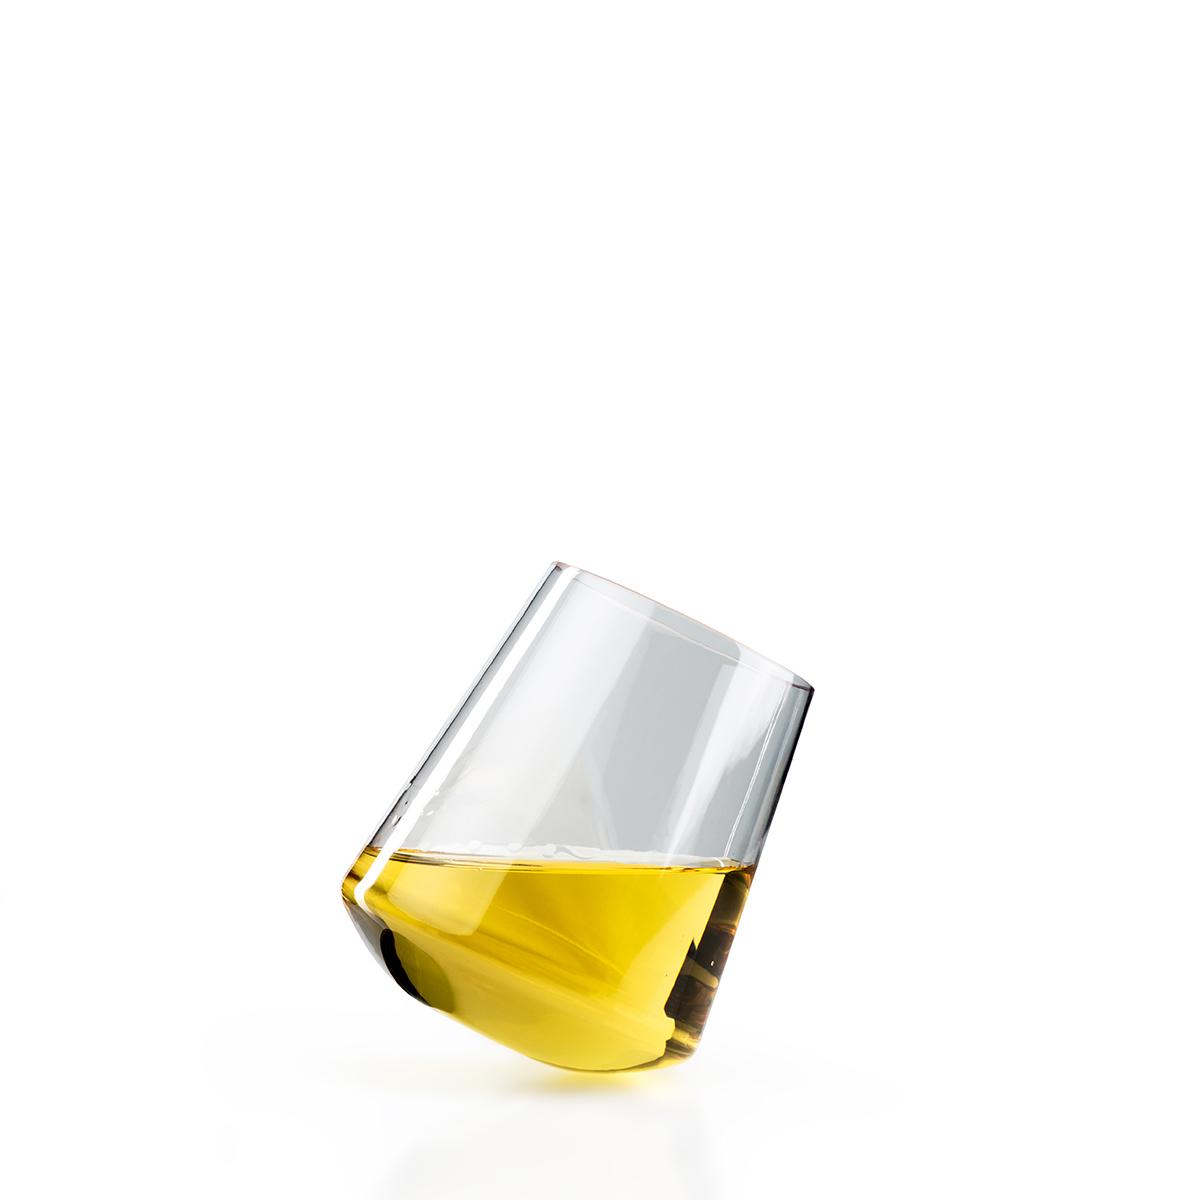 AIRMKT eCom PN XXXXXX GSI Stemless Wine 3 WEB